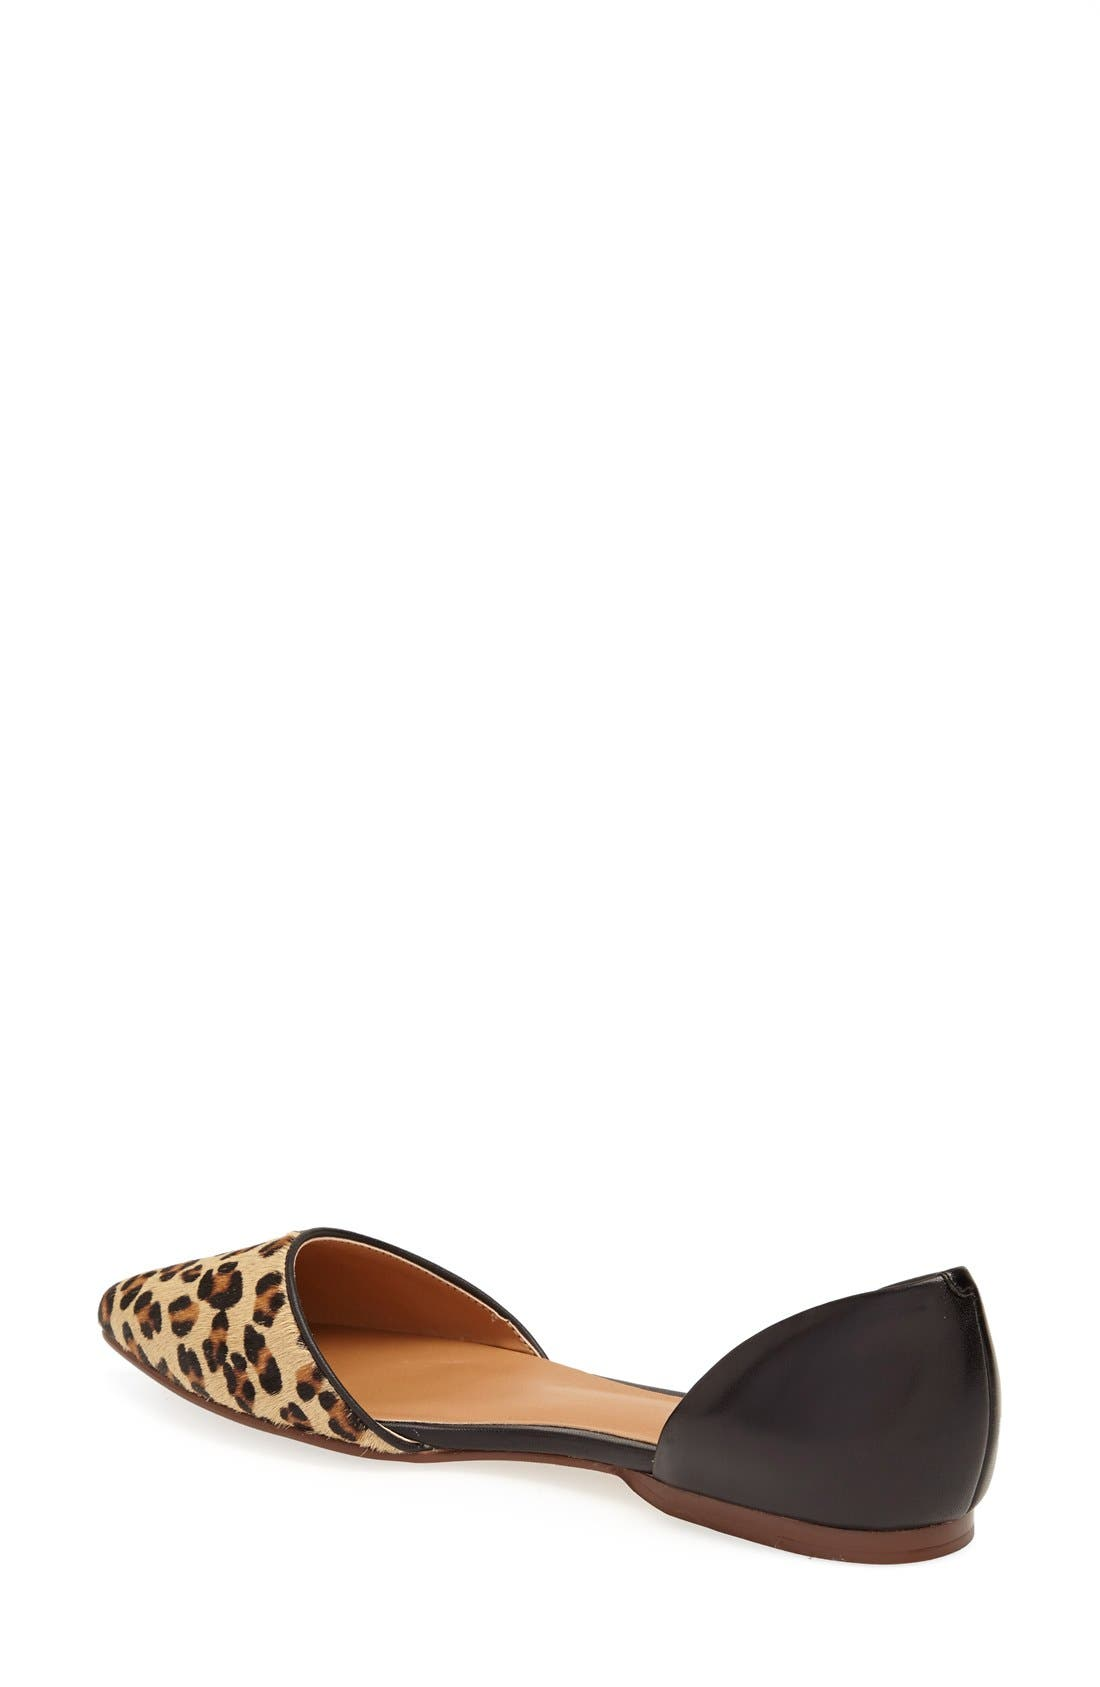 ,                             'Kayla' Leather & Calf Hair Pointy Toe Flat,                             Alternate thumbnail 4, color,                             240